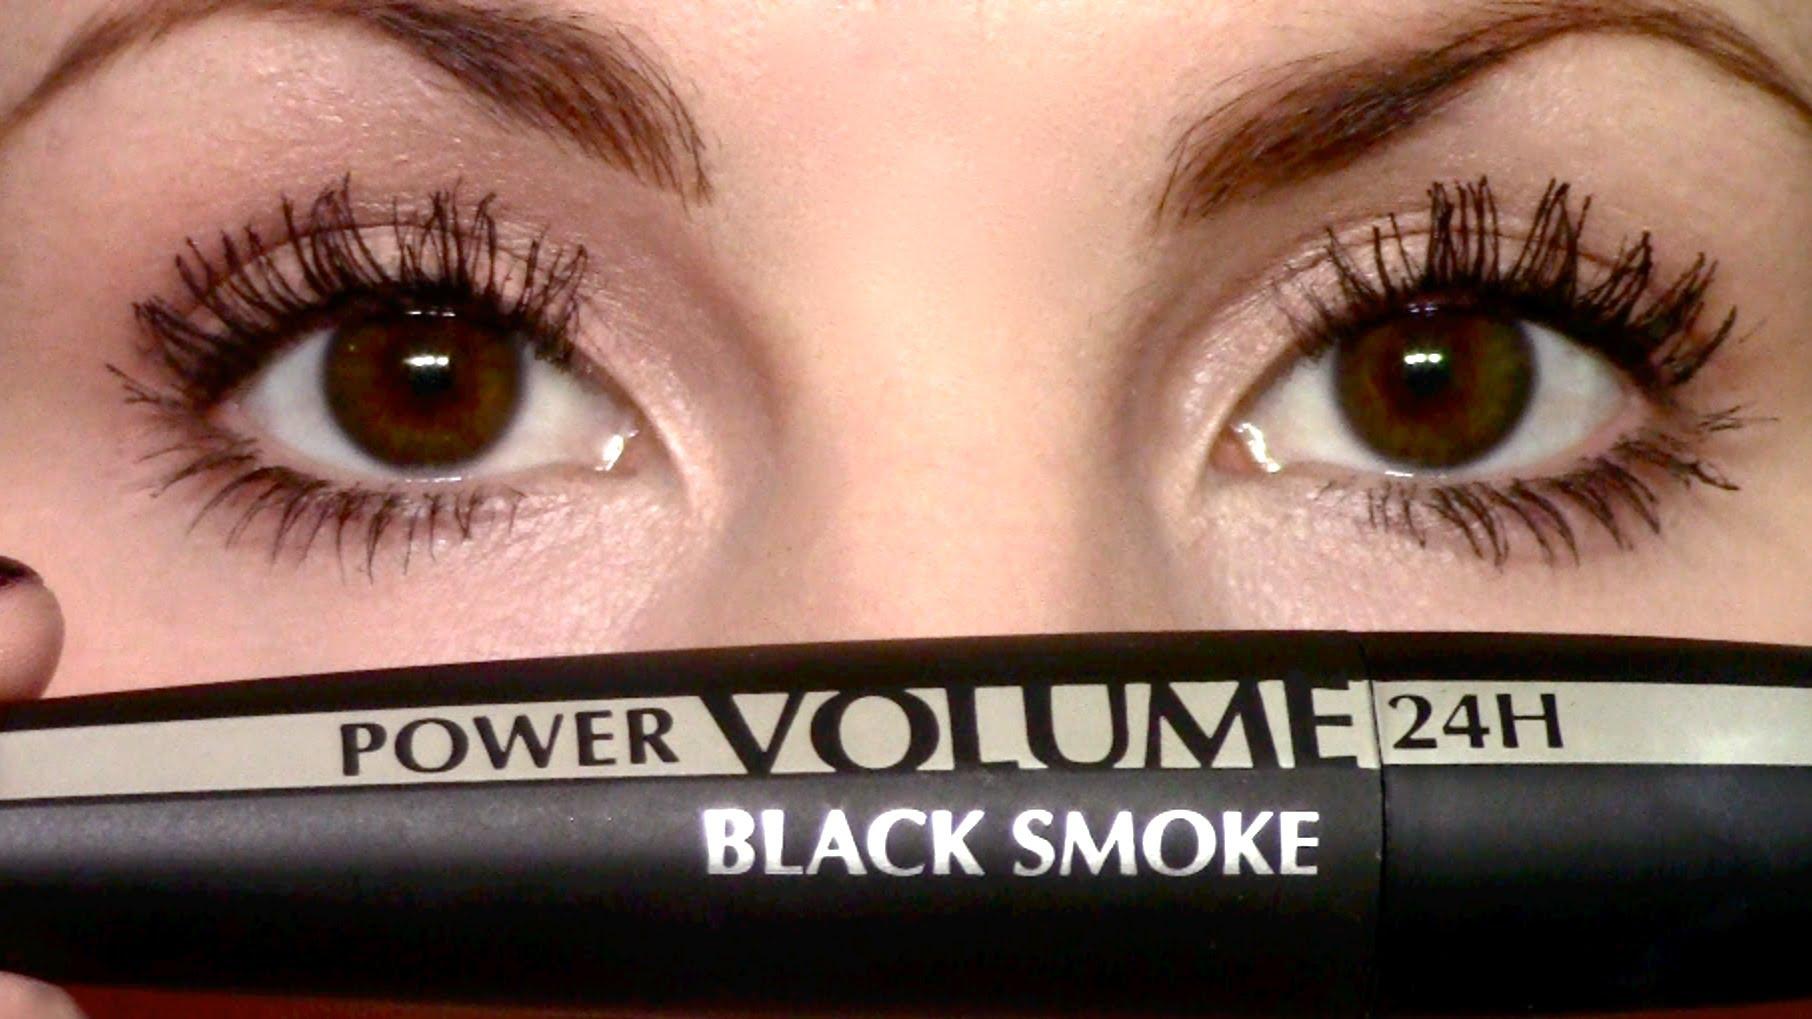 L'Oreal Extra-Volume Collagene Mascara - Black Smoke